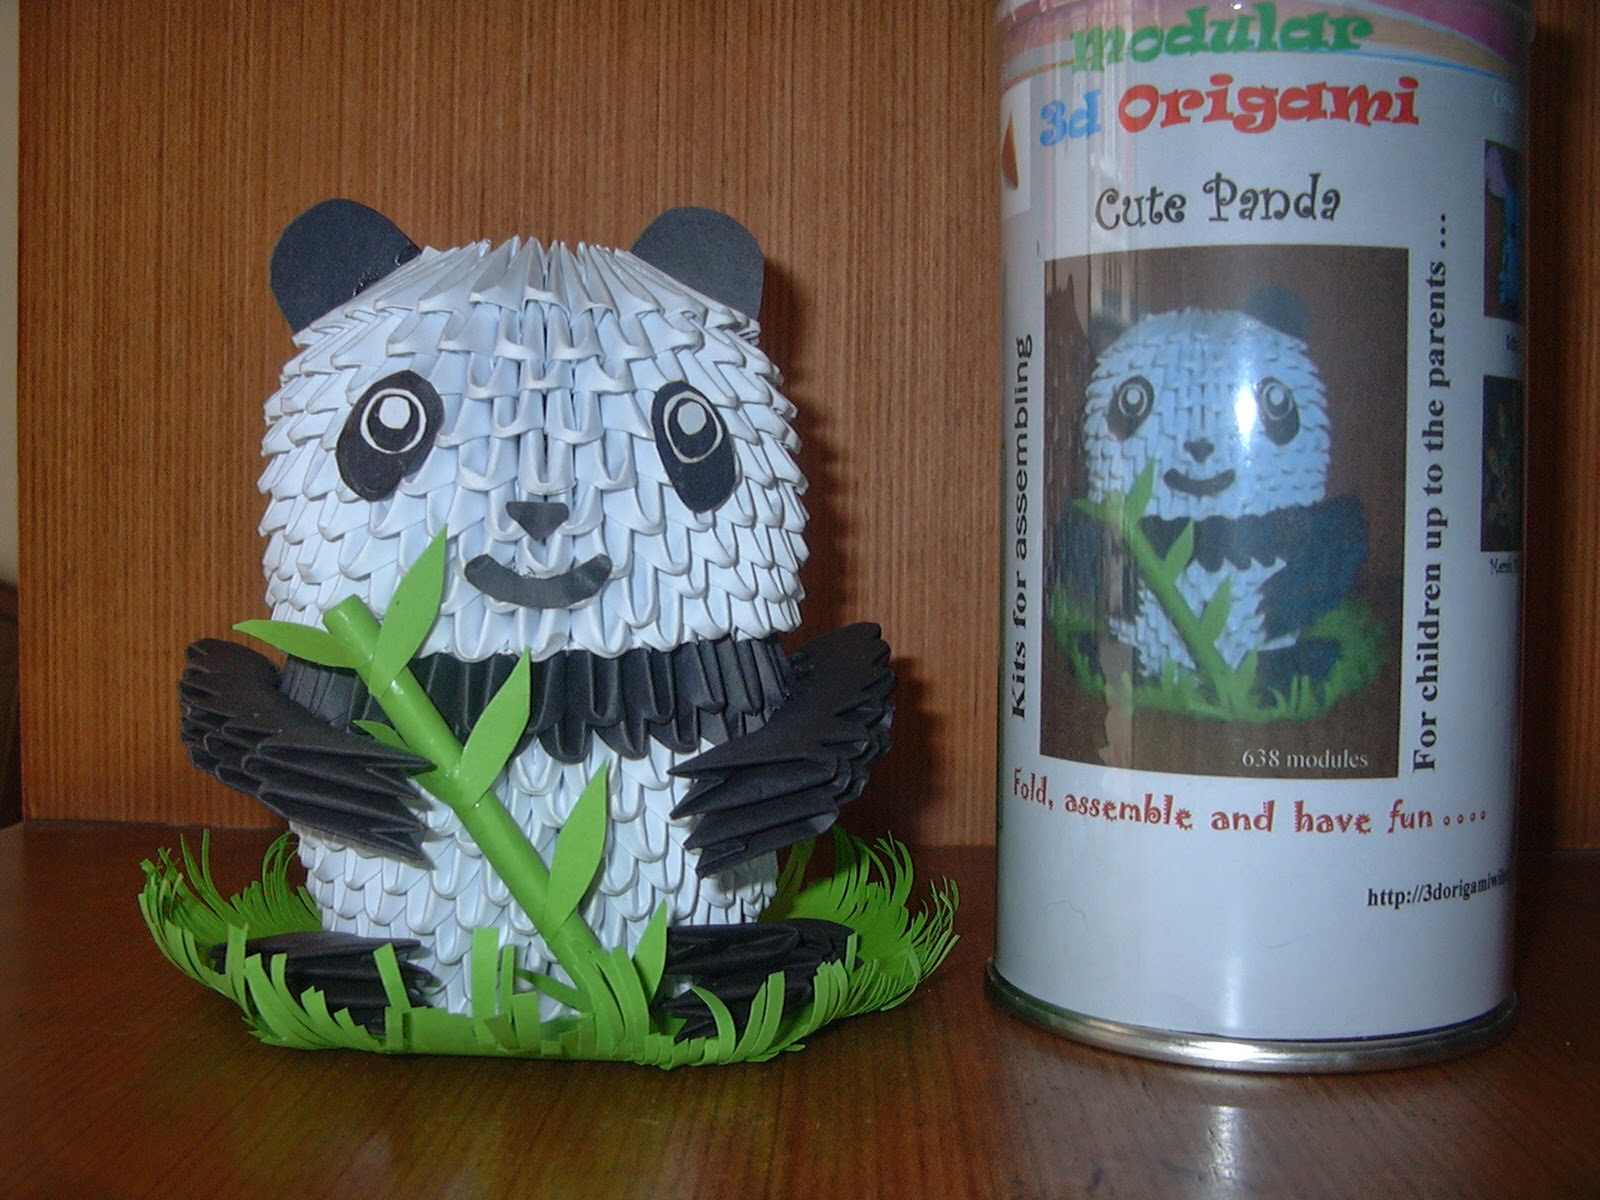 3dorigamiwilsujblogspot 2013 02 Model 3d Origami Animals